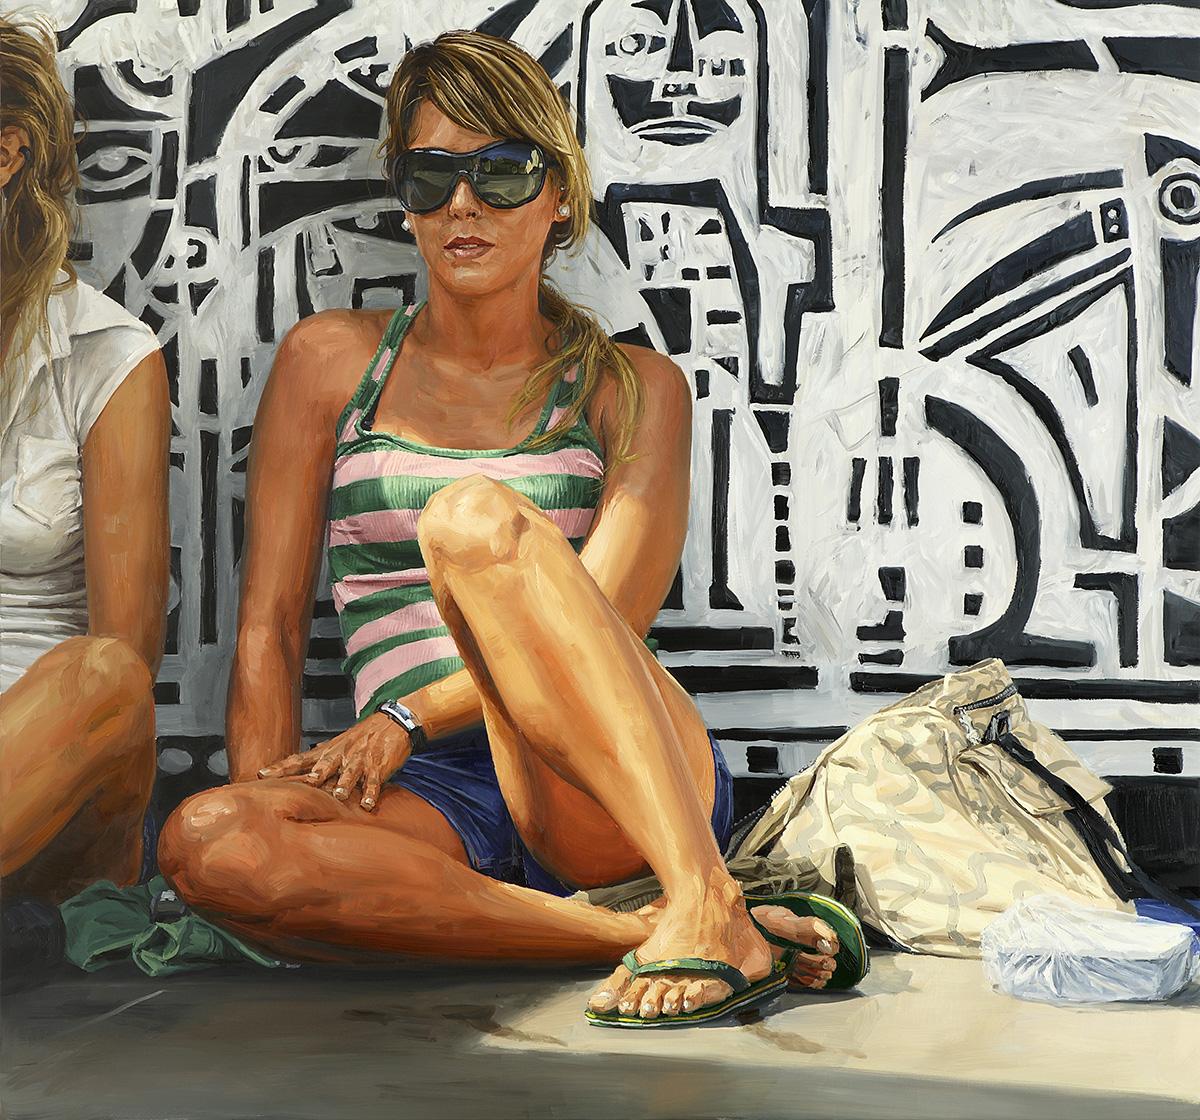 girl-sitting-sunglasses-140x150cm.jpg